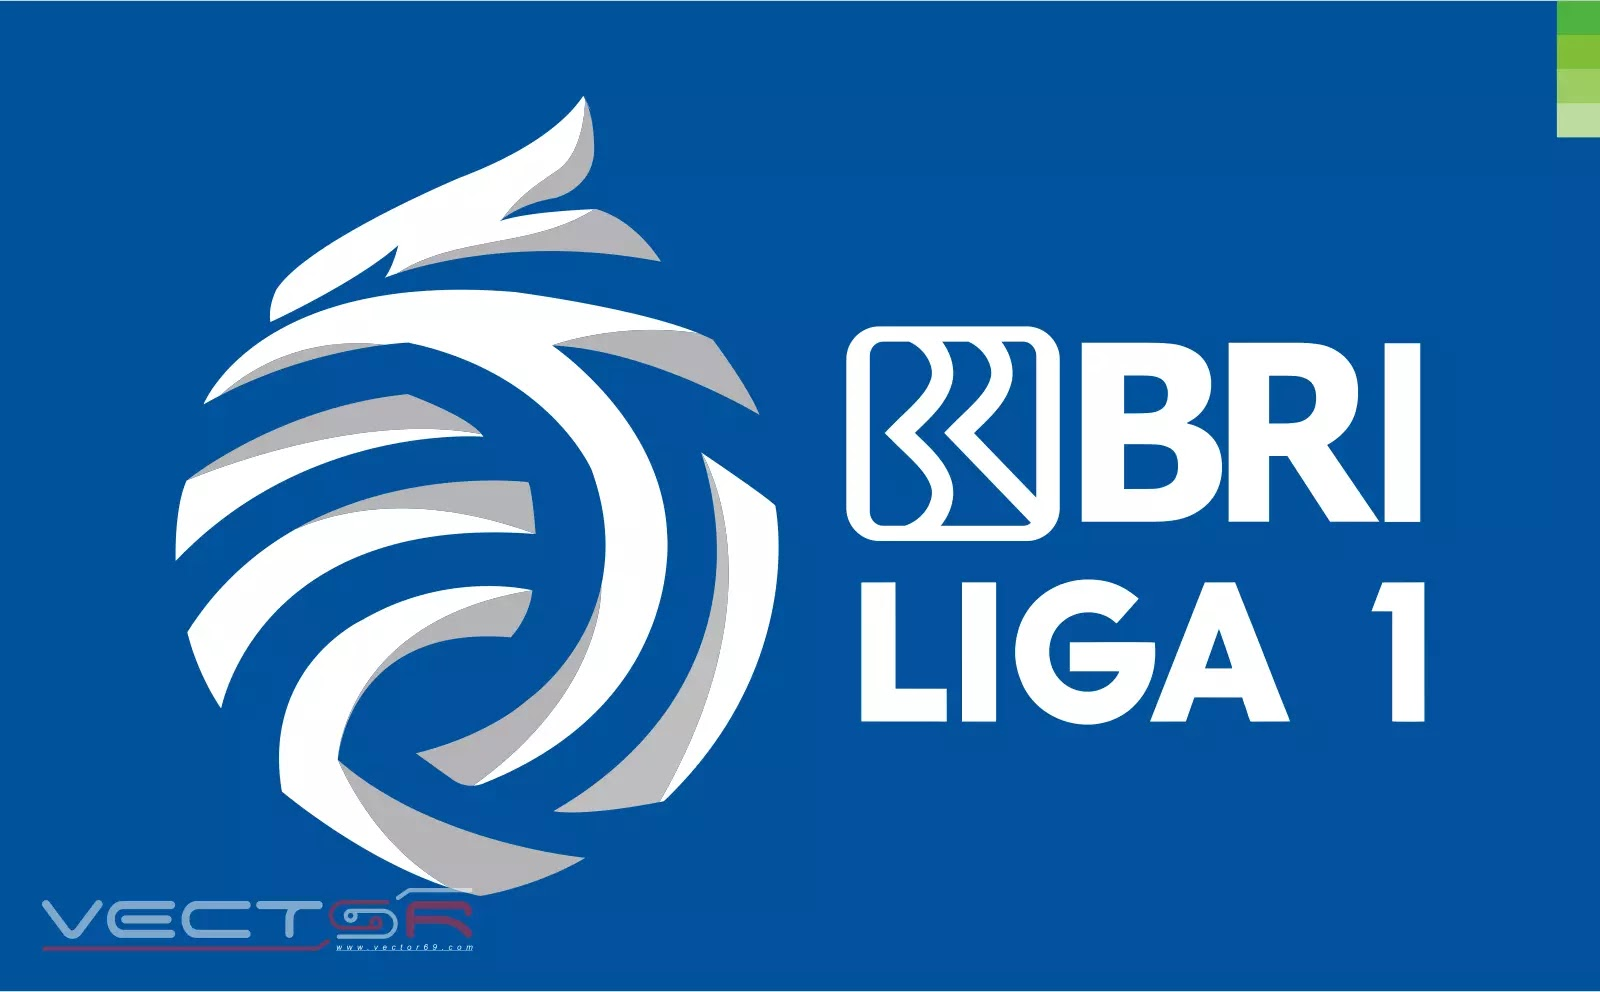 BRI Liga 1 Indonesia Secondary Logo - Download Vector File CDR (CorelDraw)